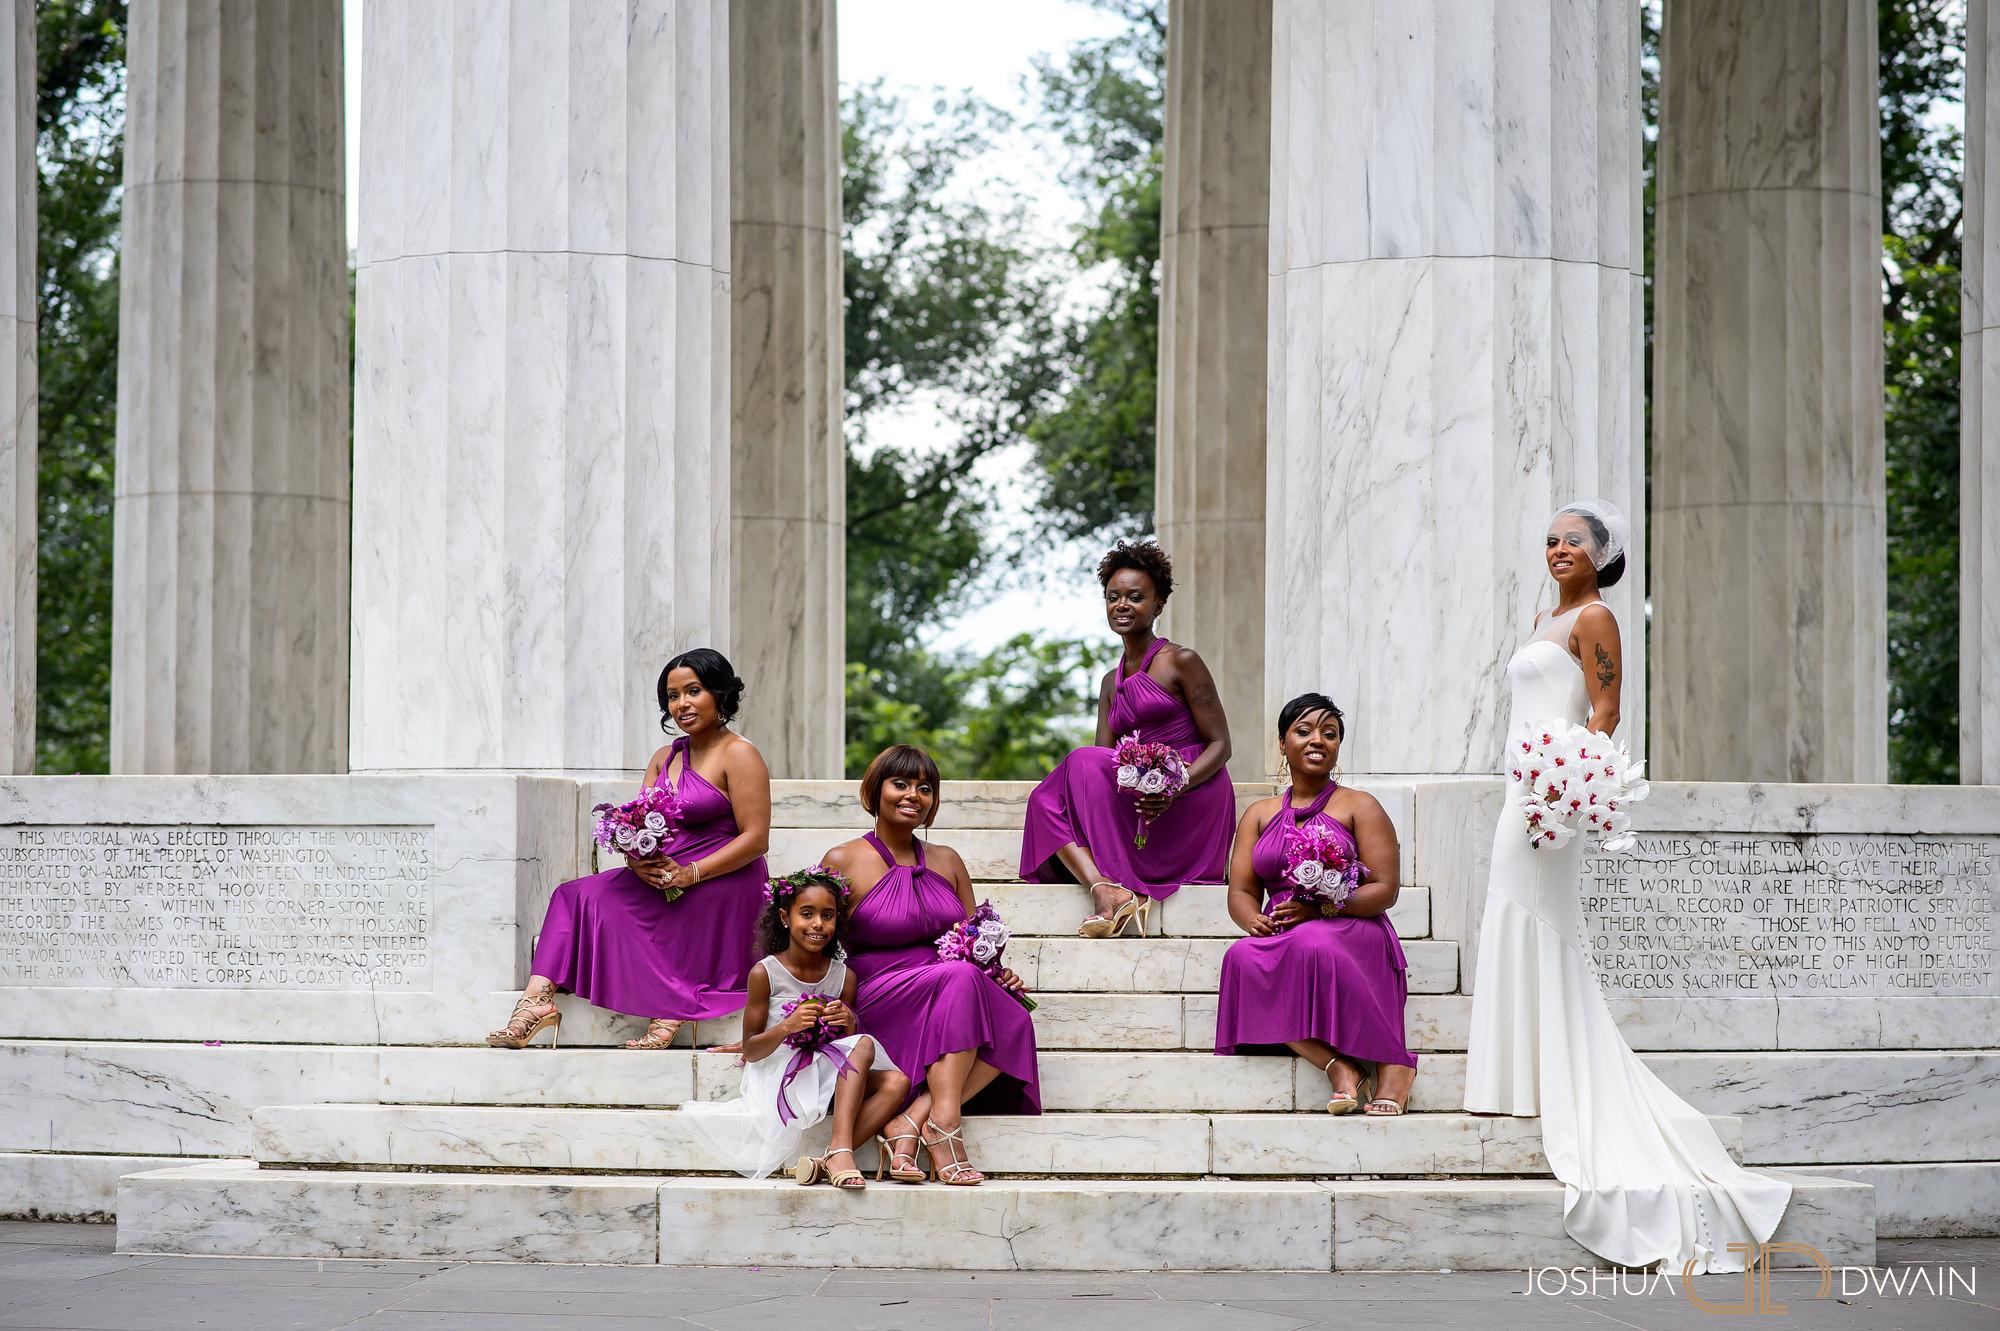 joshua-dwain-weddings-gallery-best-wedding-photographers-us-034